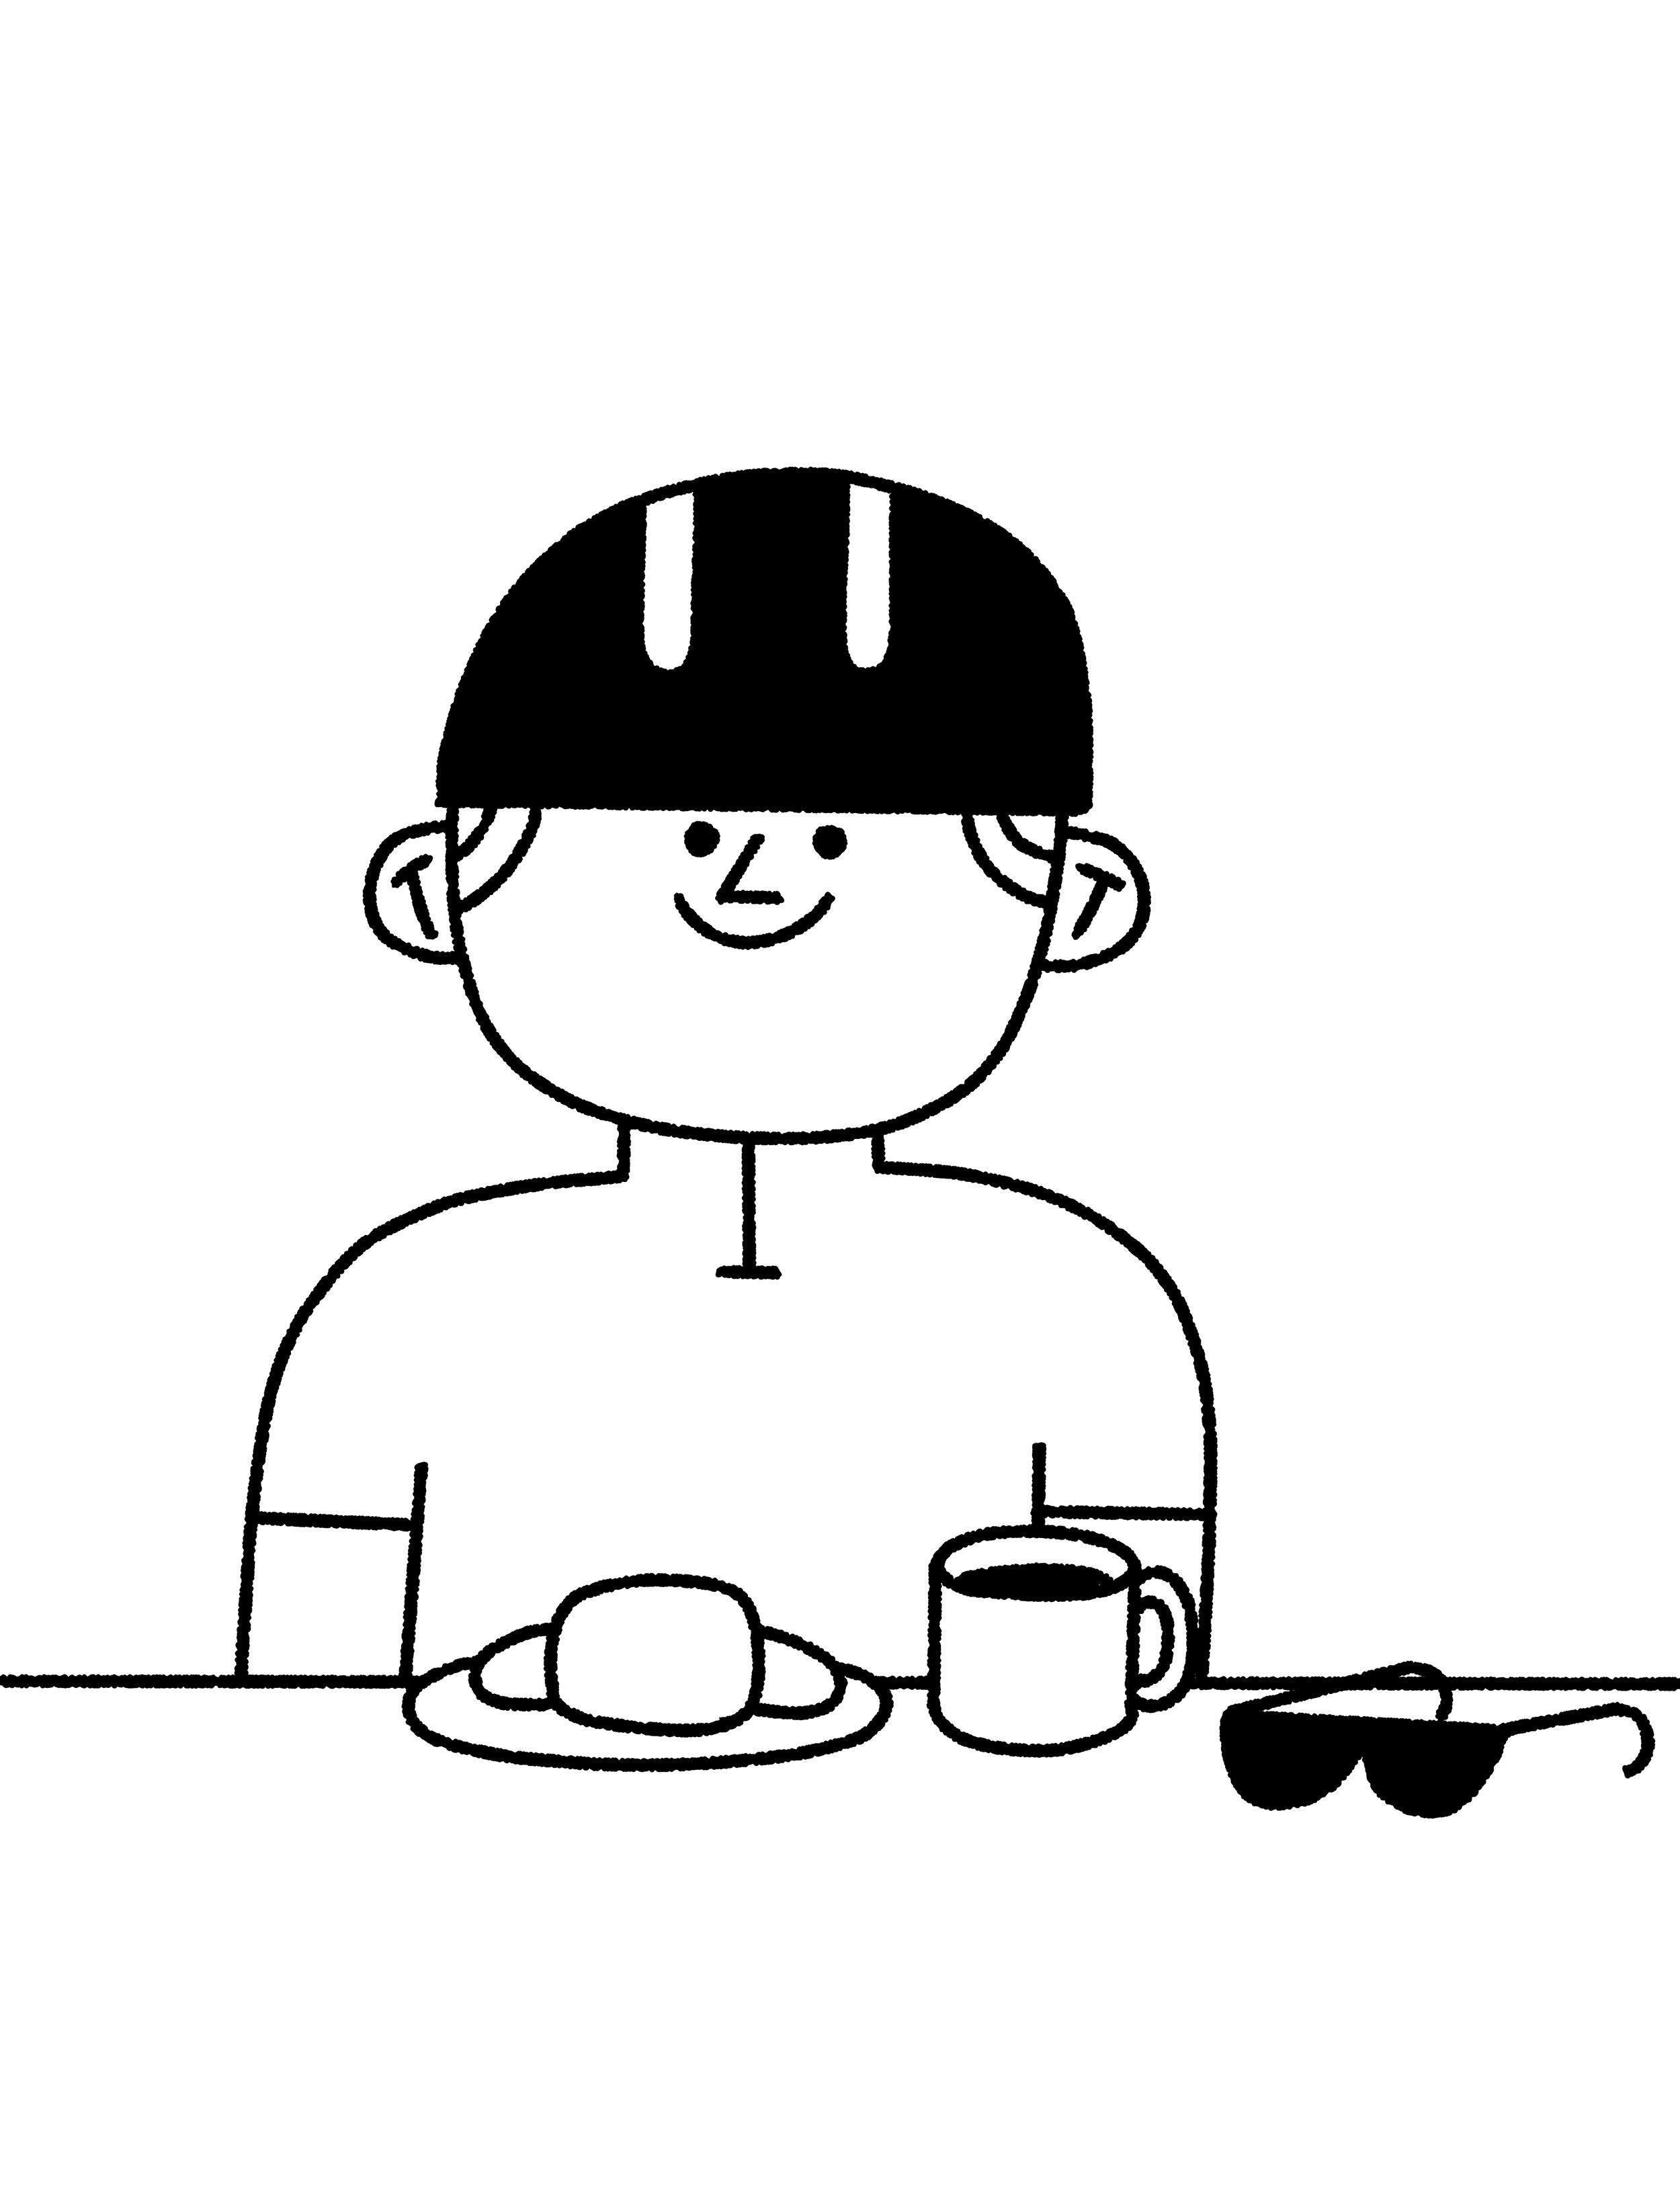 NY Food cyclist final.jpg